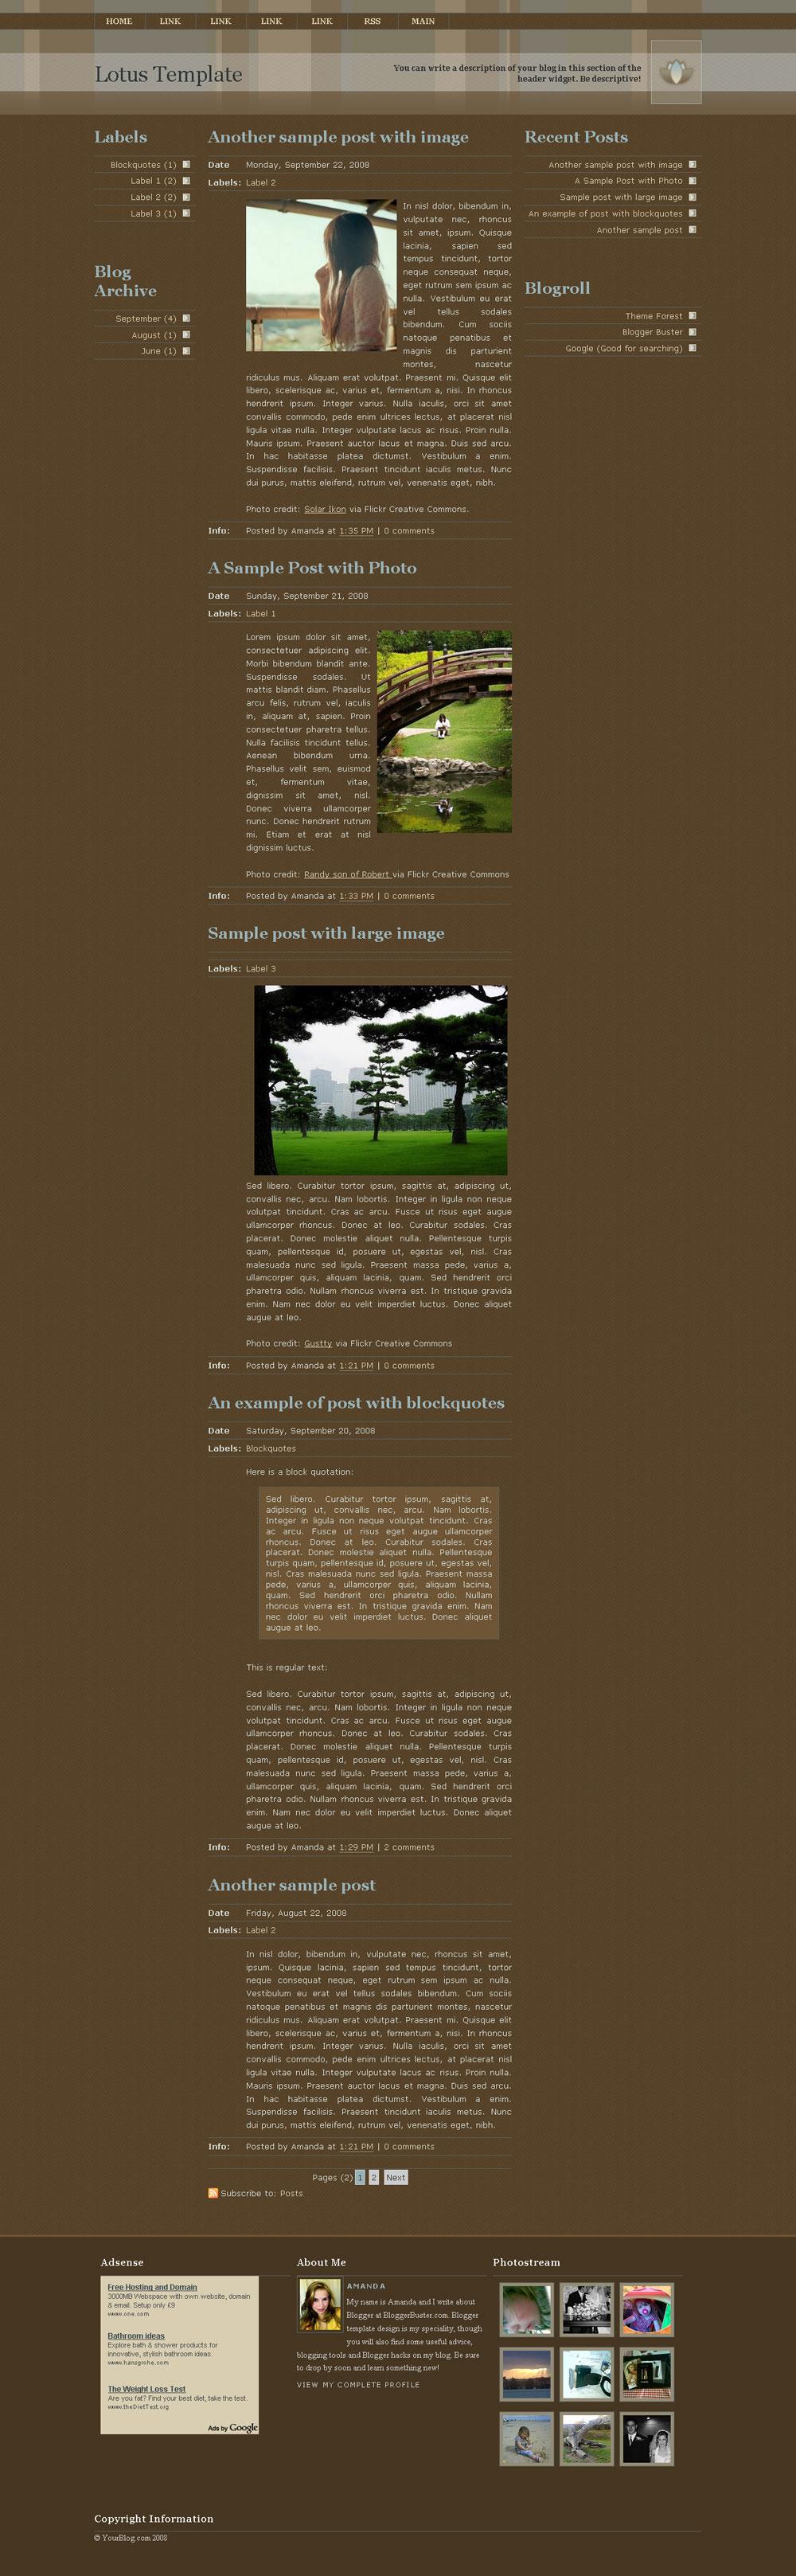 http://3.s3.envato.com/files/47398/screenshots/1_FullPage.jpg